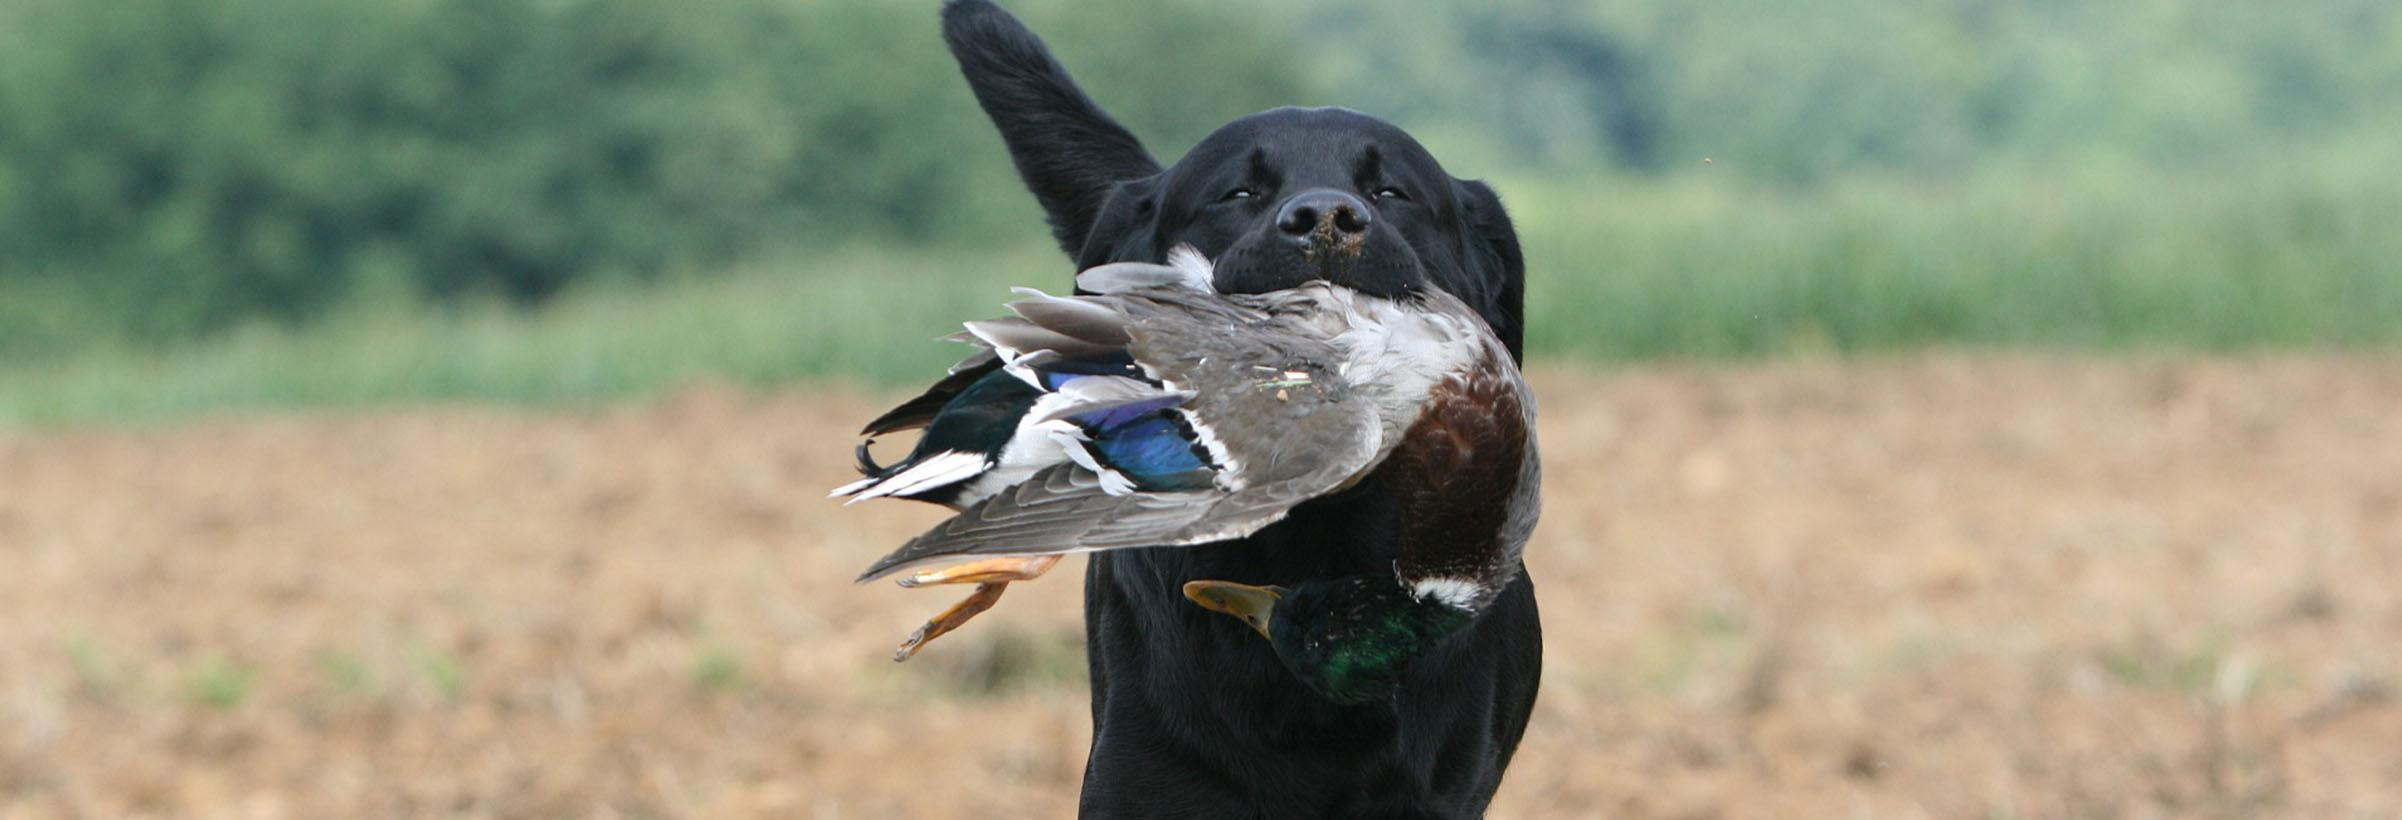 labrador chien de chasse rapporte un canard